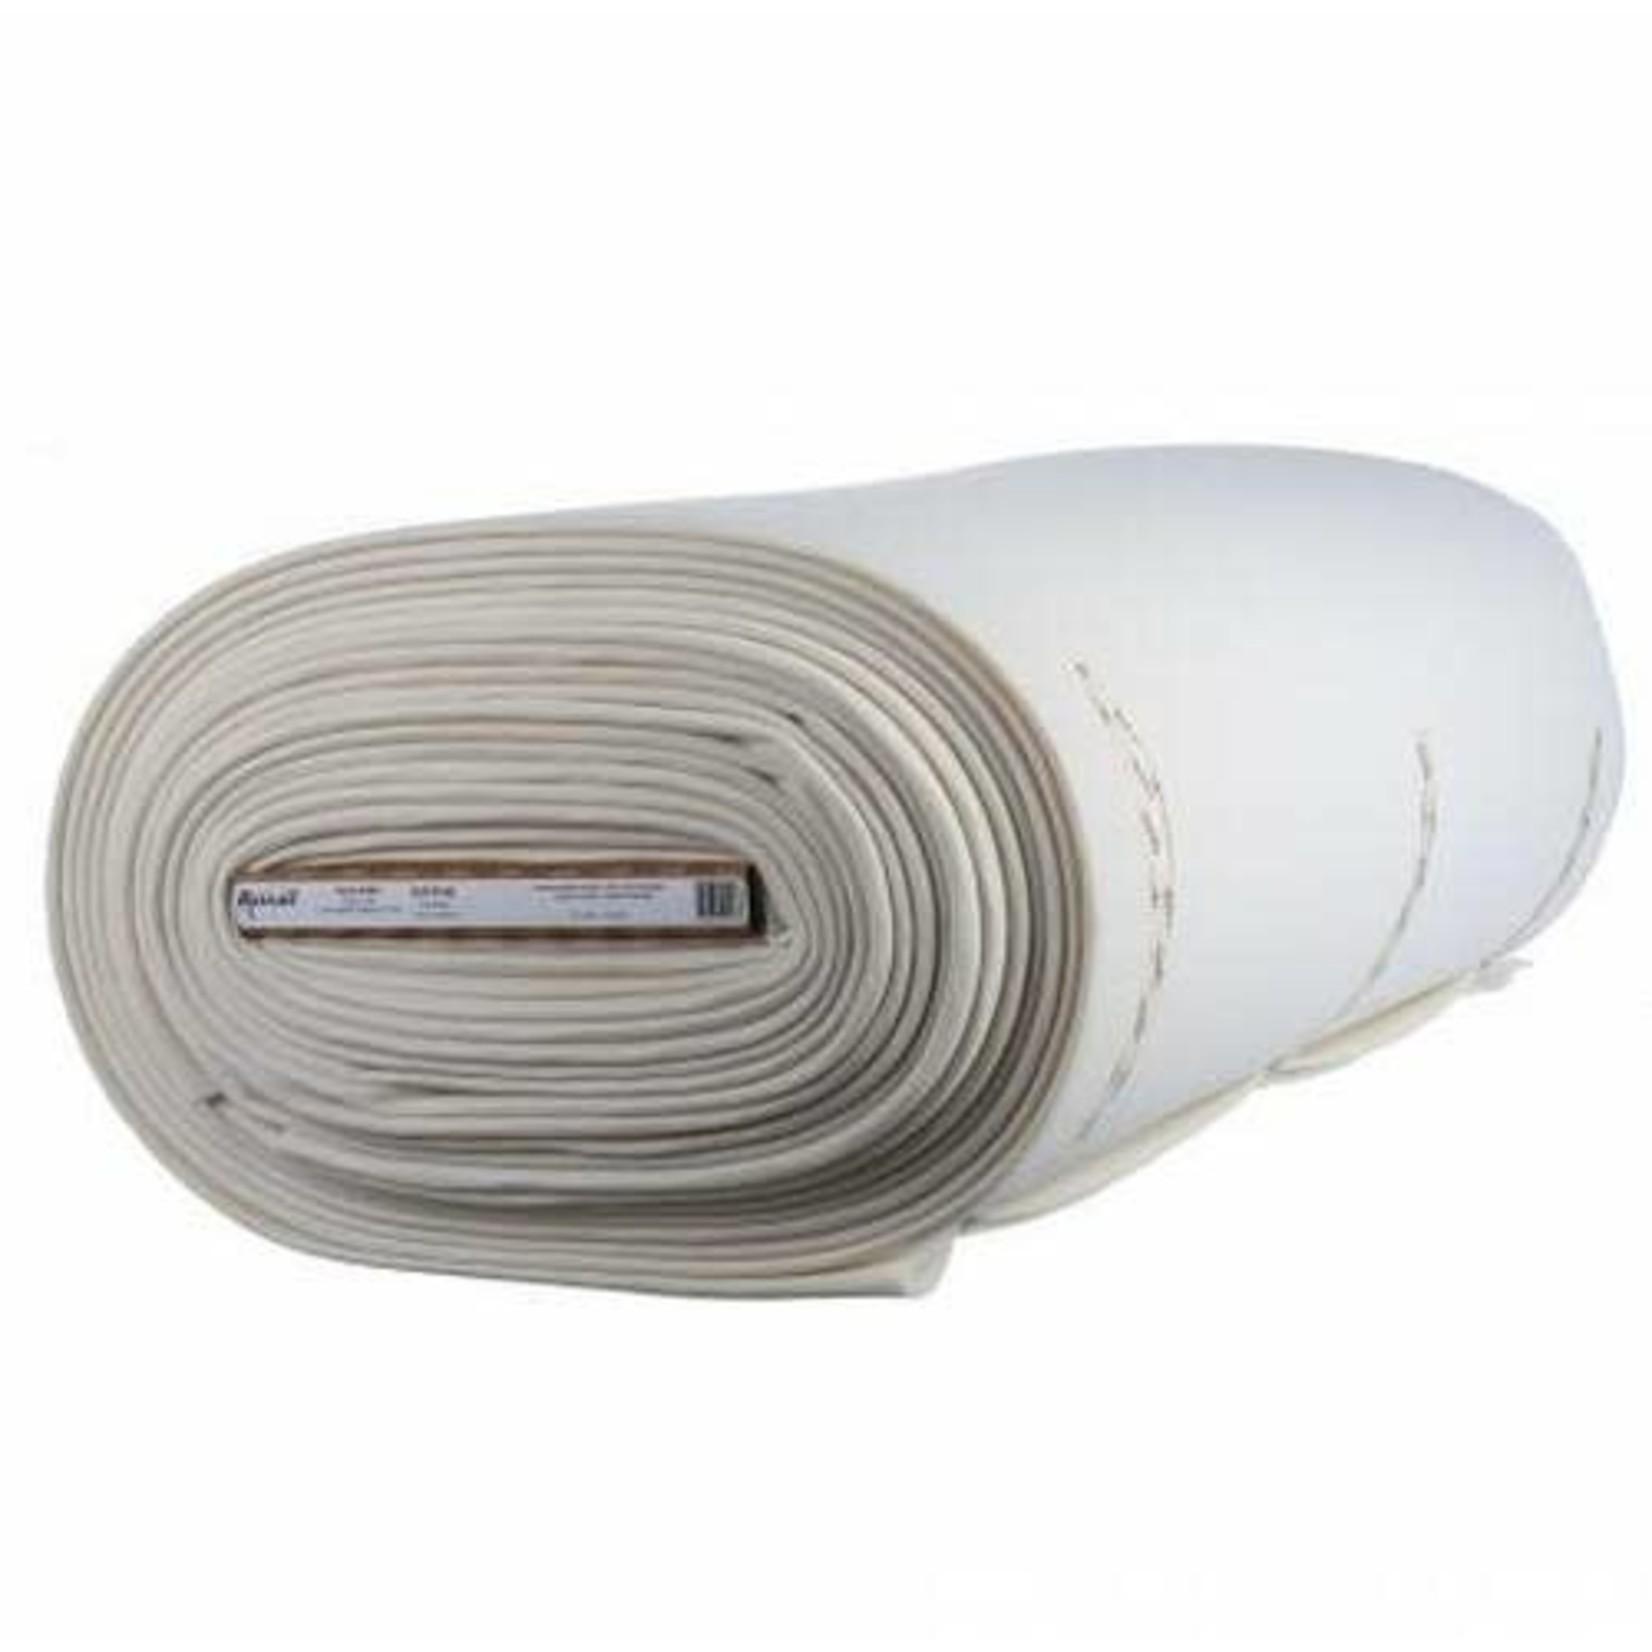 "BOSALL Bosal In-R-Form Double Sided Fusible Foam 58"" wide $0.41 per cm or $41/m"